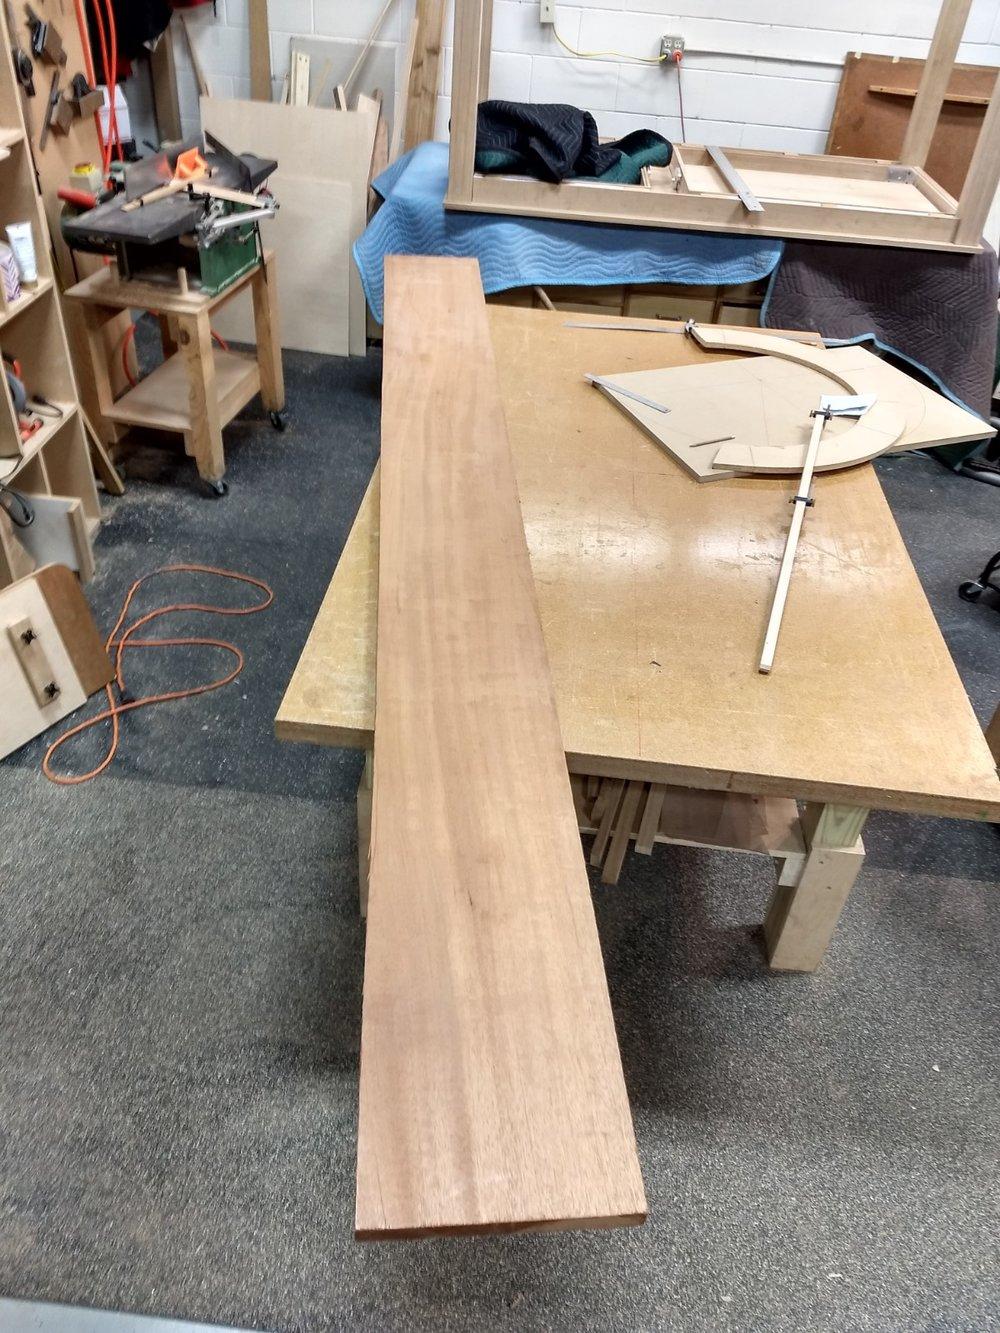 A luxurious piece of mahogany